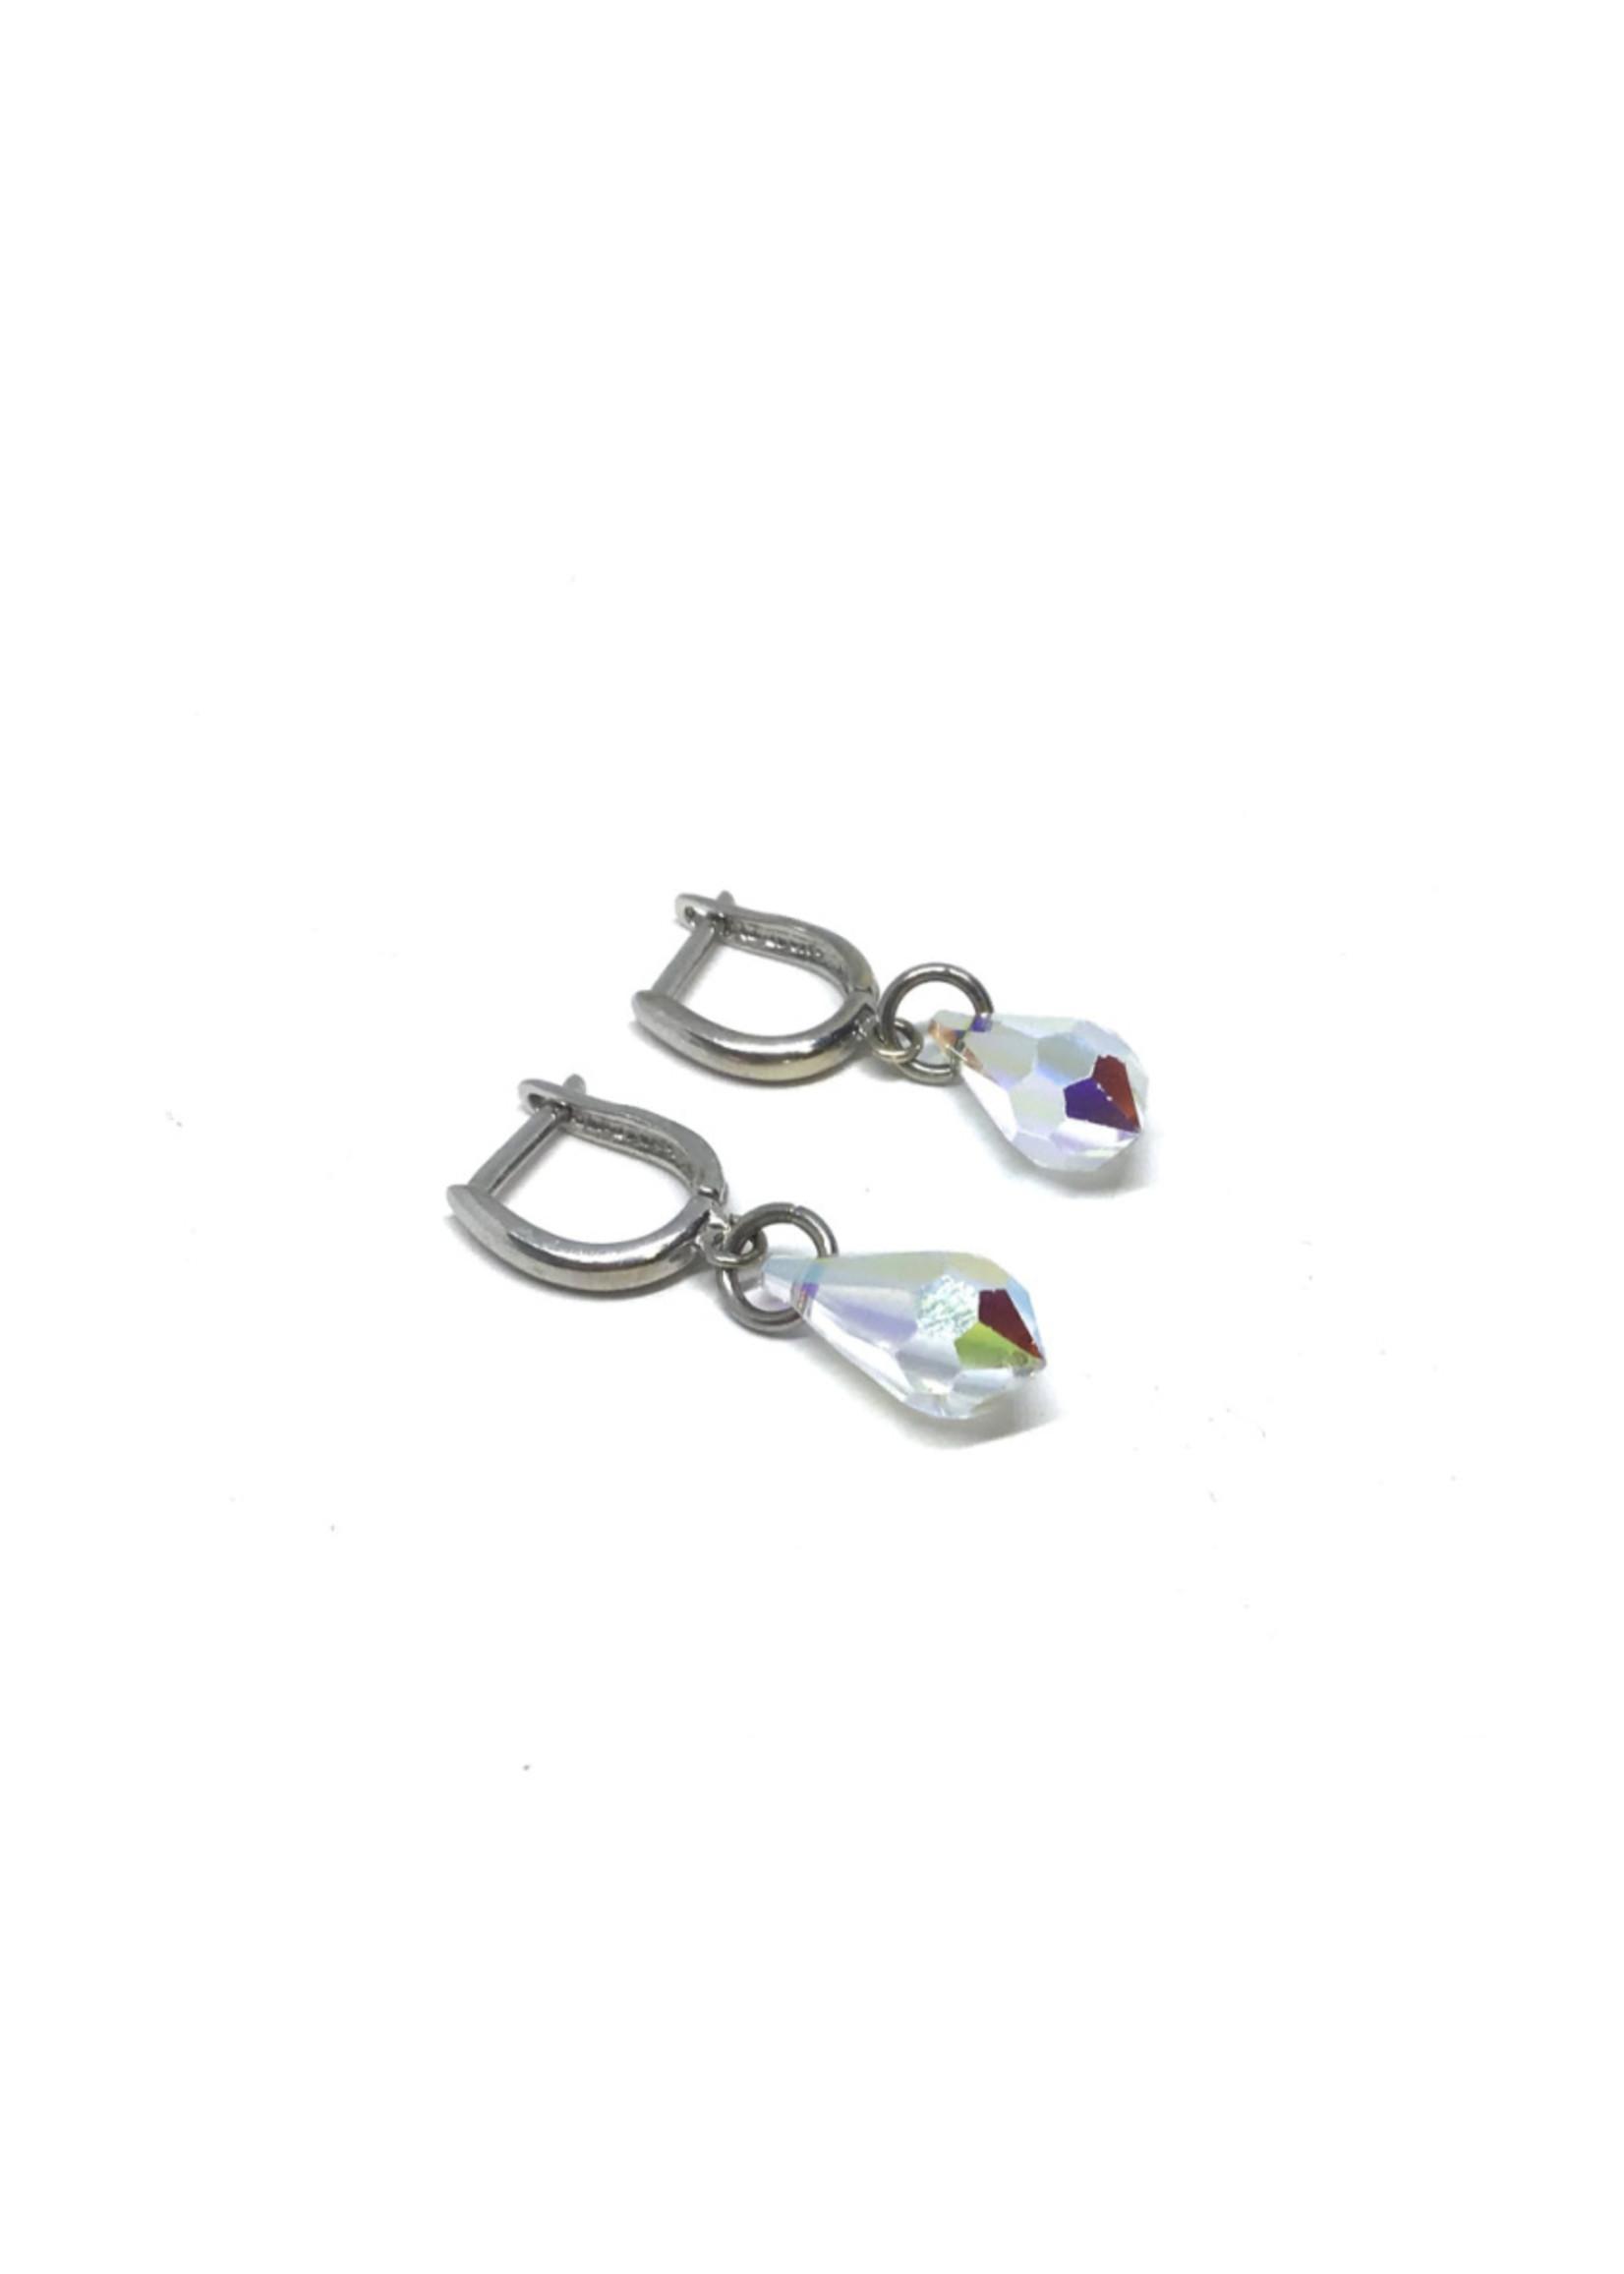 Boucles d'oreilles Crystal Swarovski Pendantes Or blanc 10K